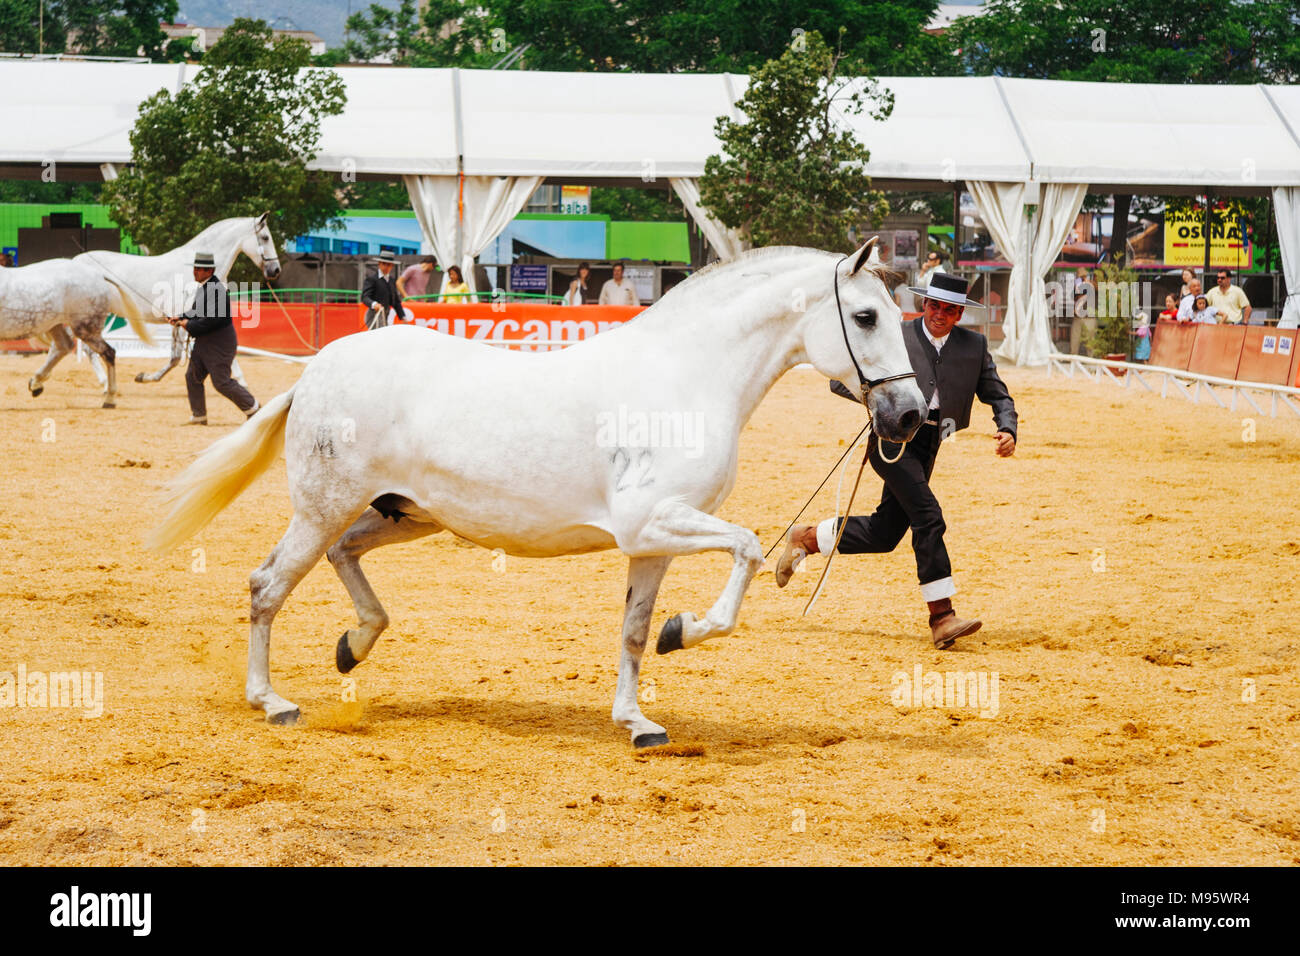 Córdoba, Andalucía, España : jinetes y thoroughbreeds andaluz en la Feria del Caballo de Córdoba. Foto de stock